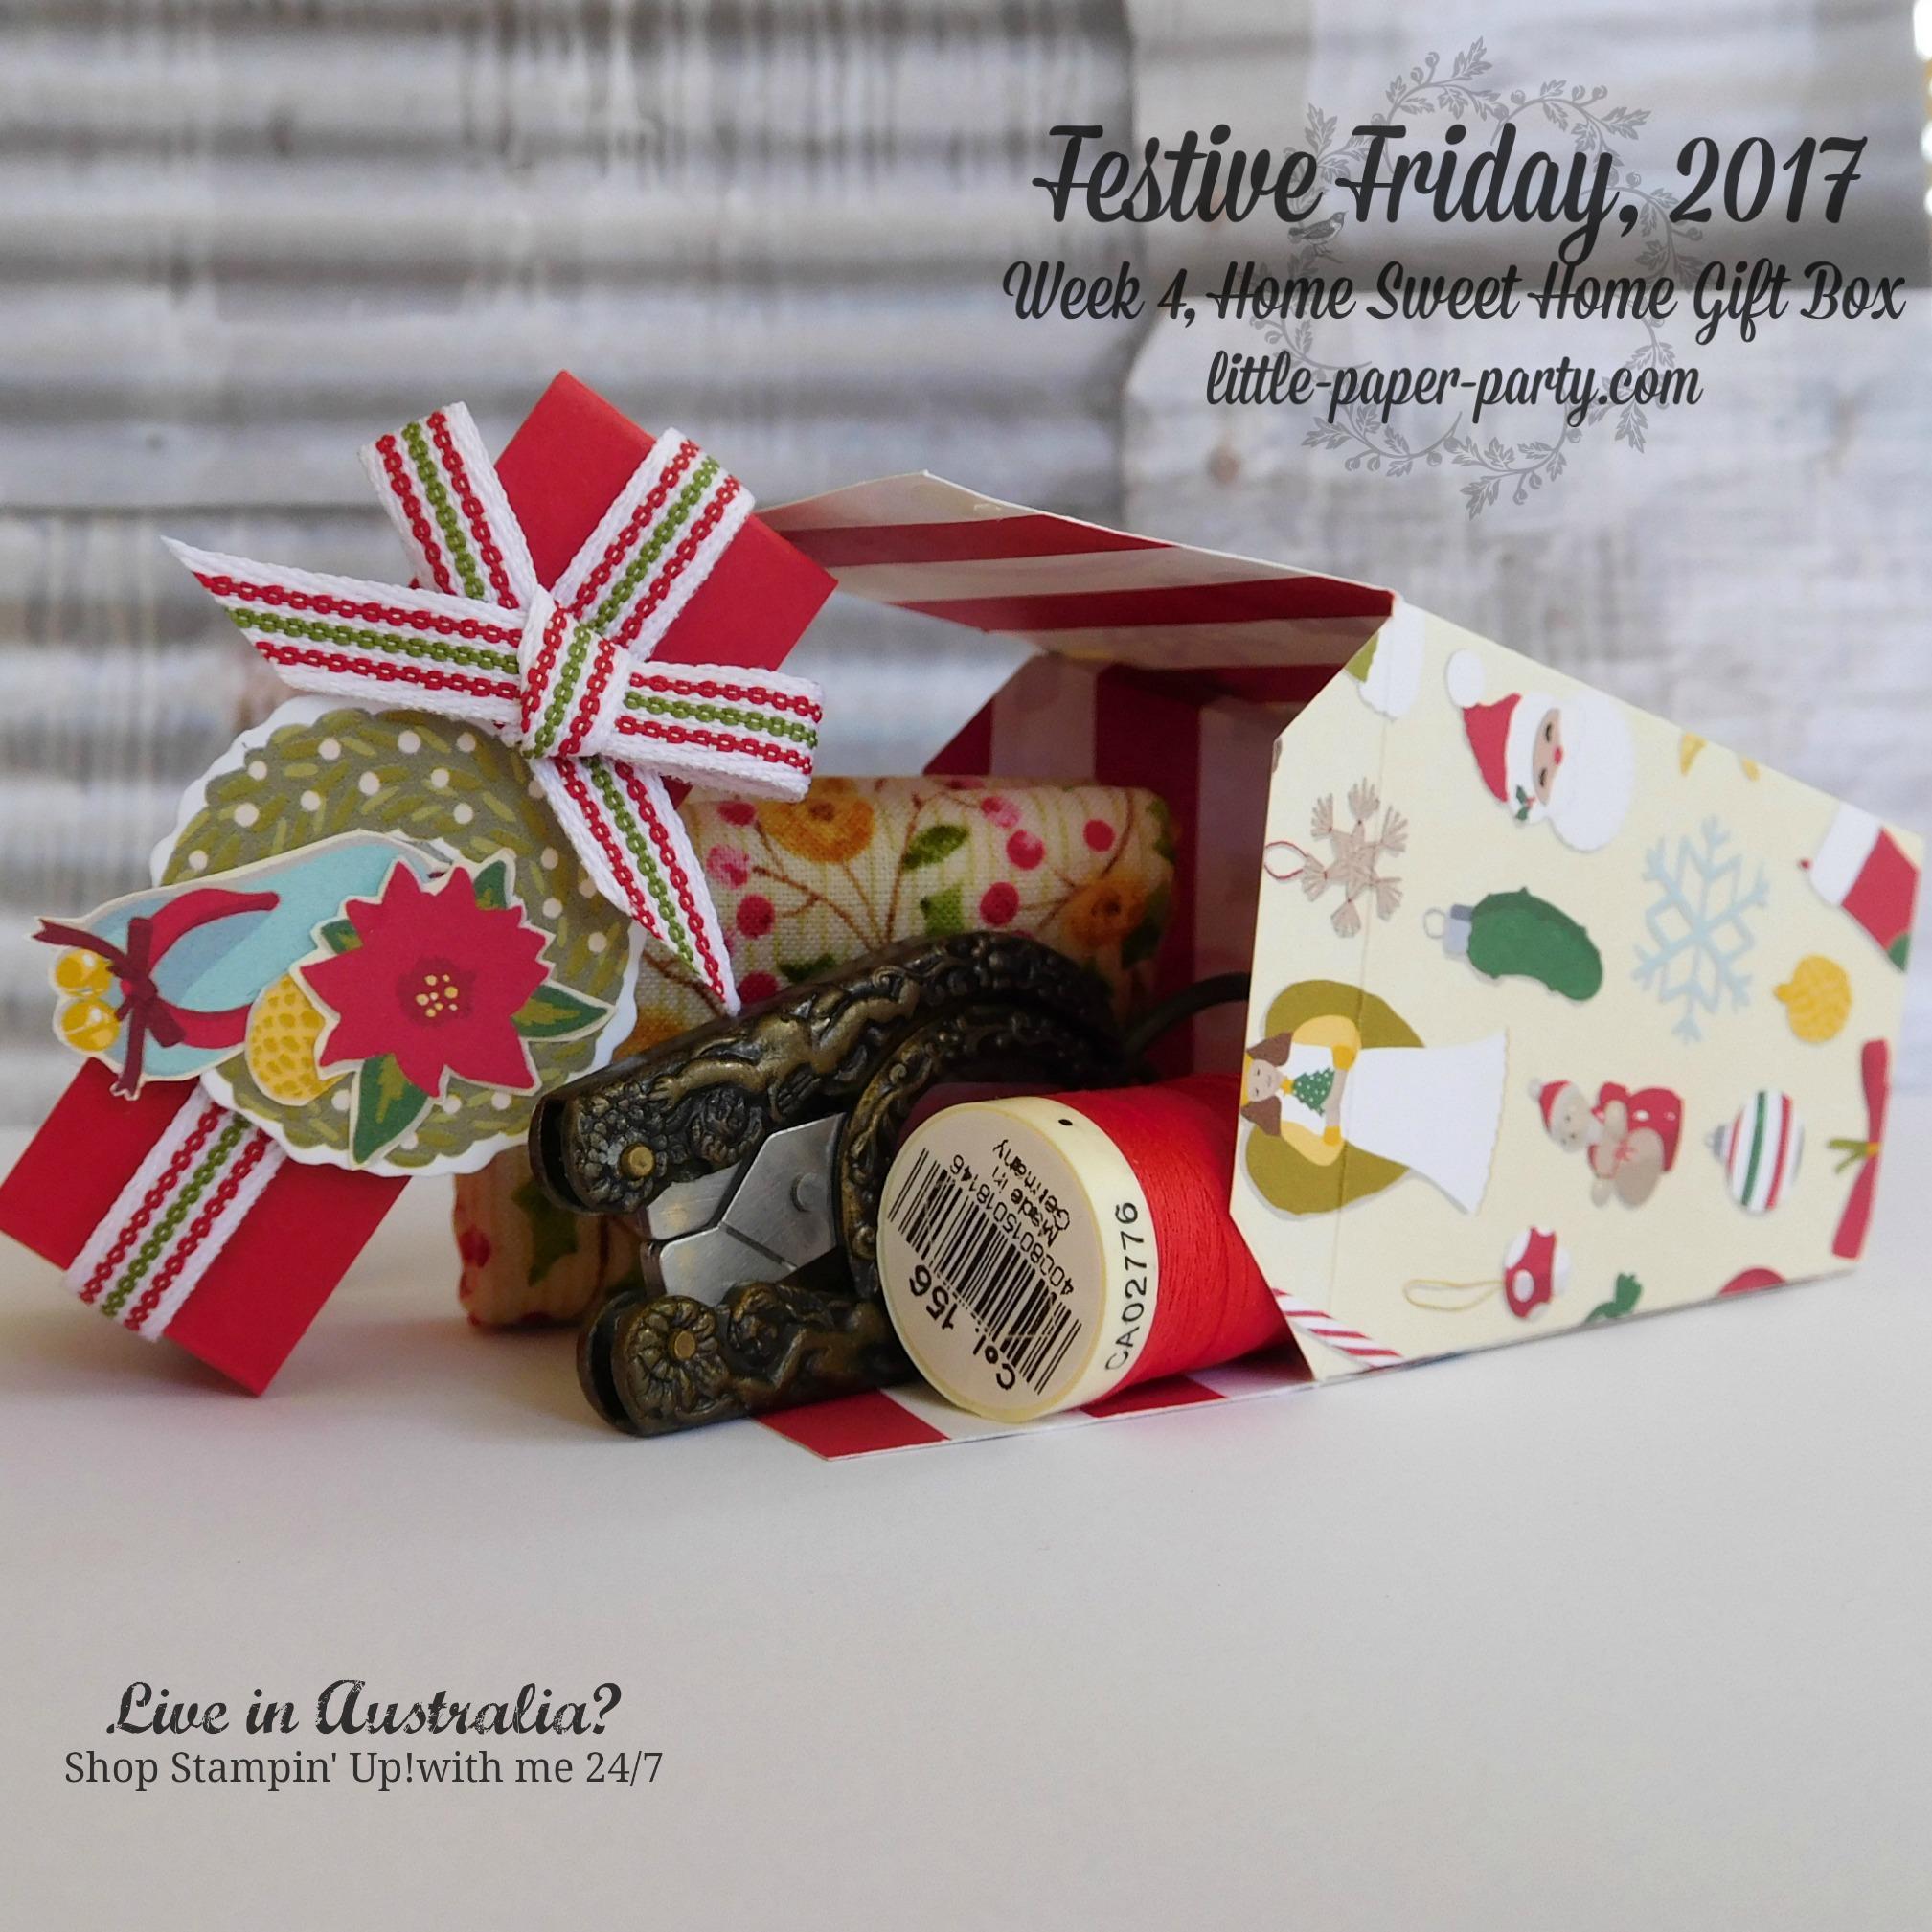 Festive Friday – littlepaperparty